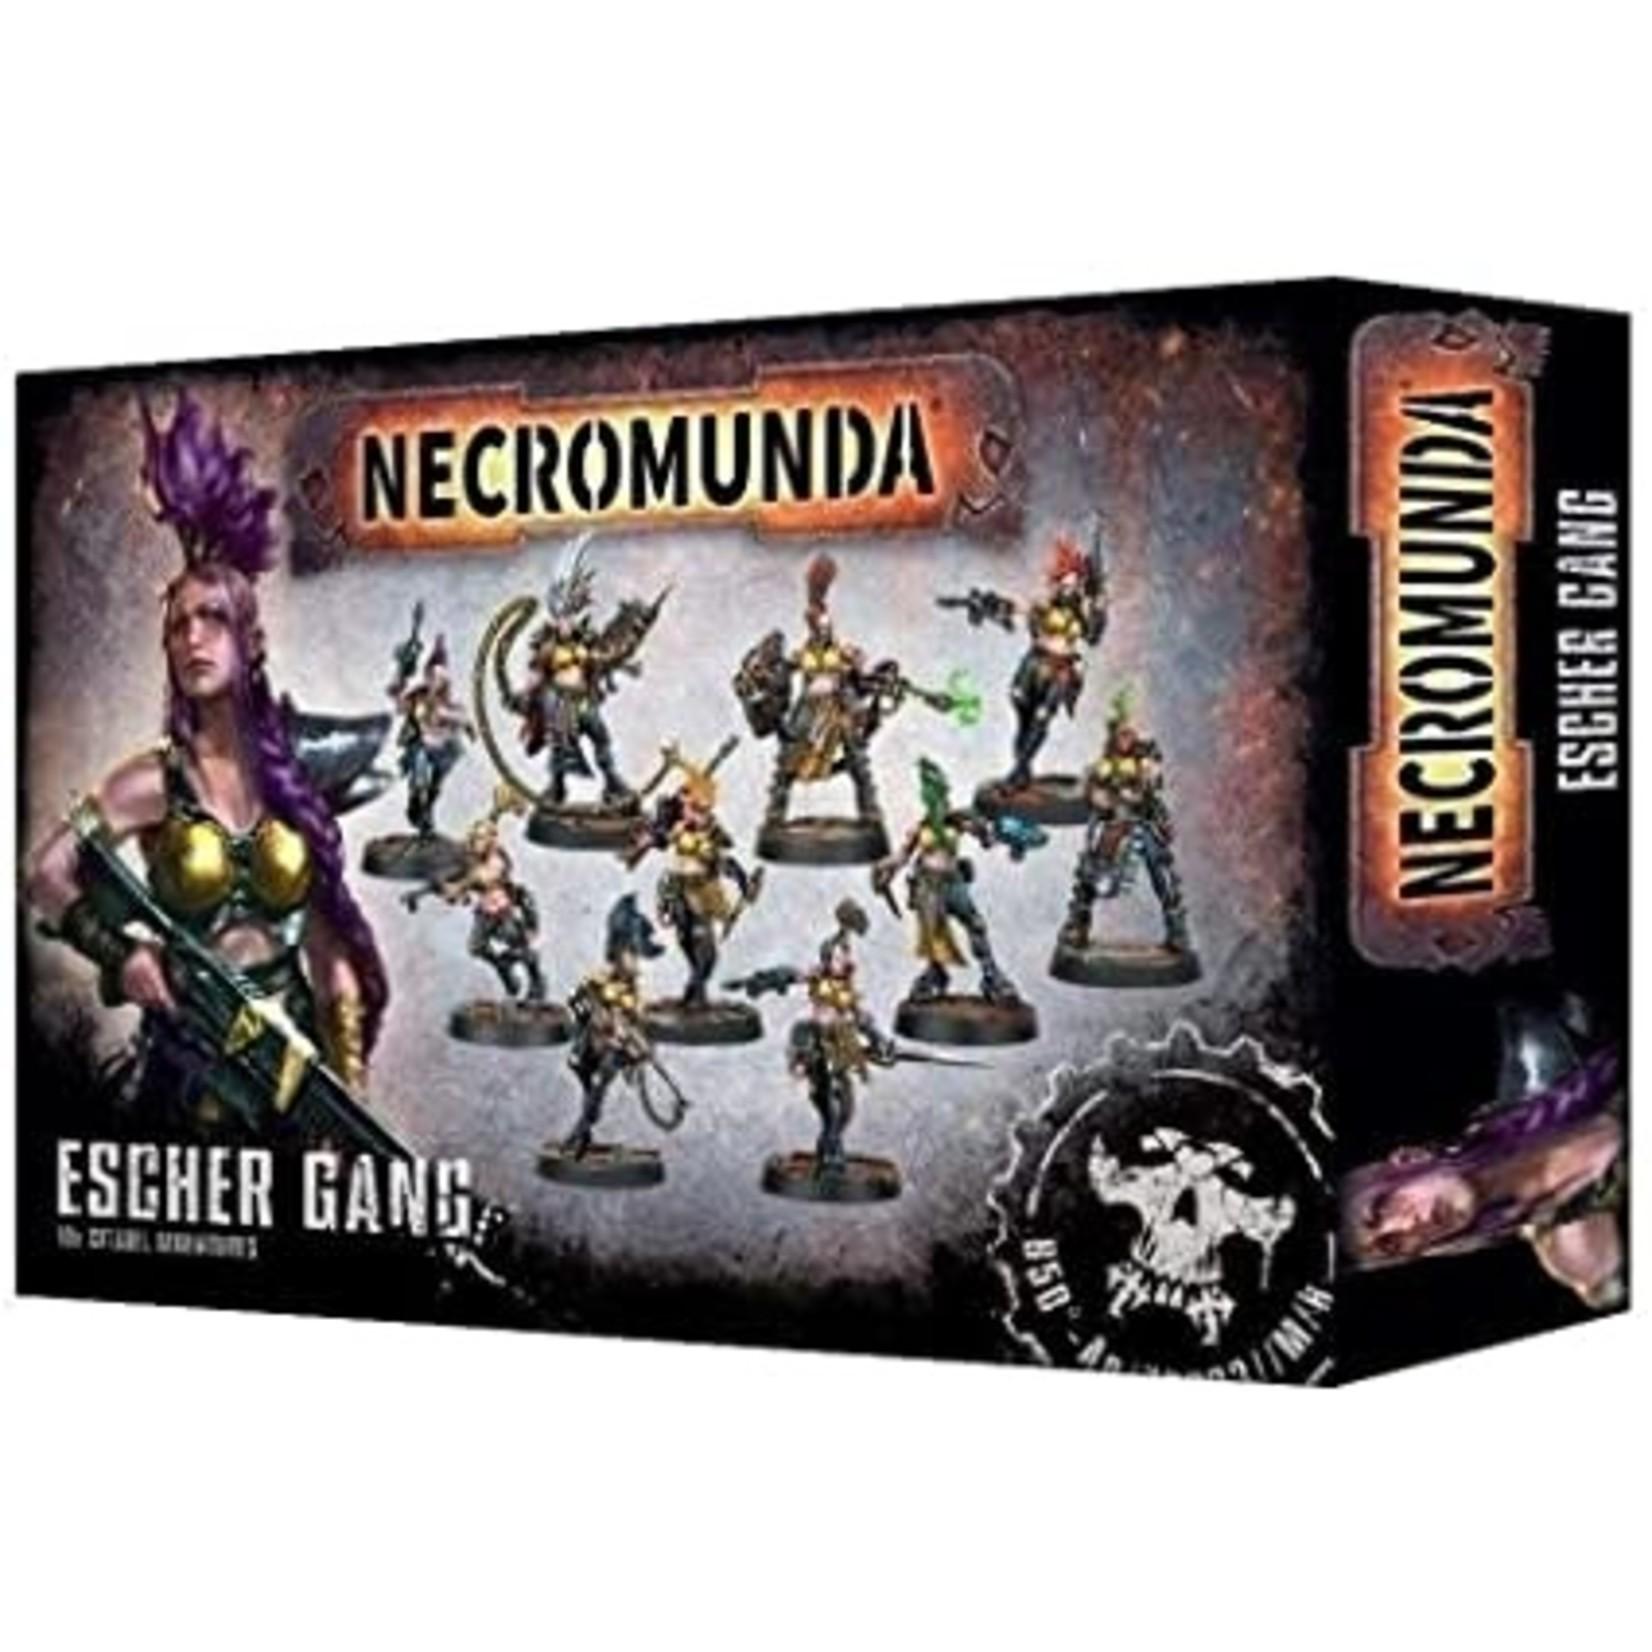 Games Workshop Necromunda Escher Gang